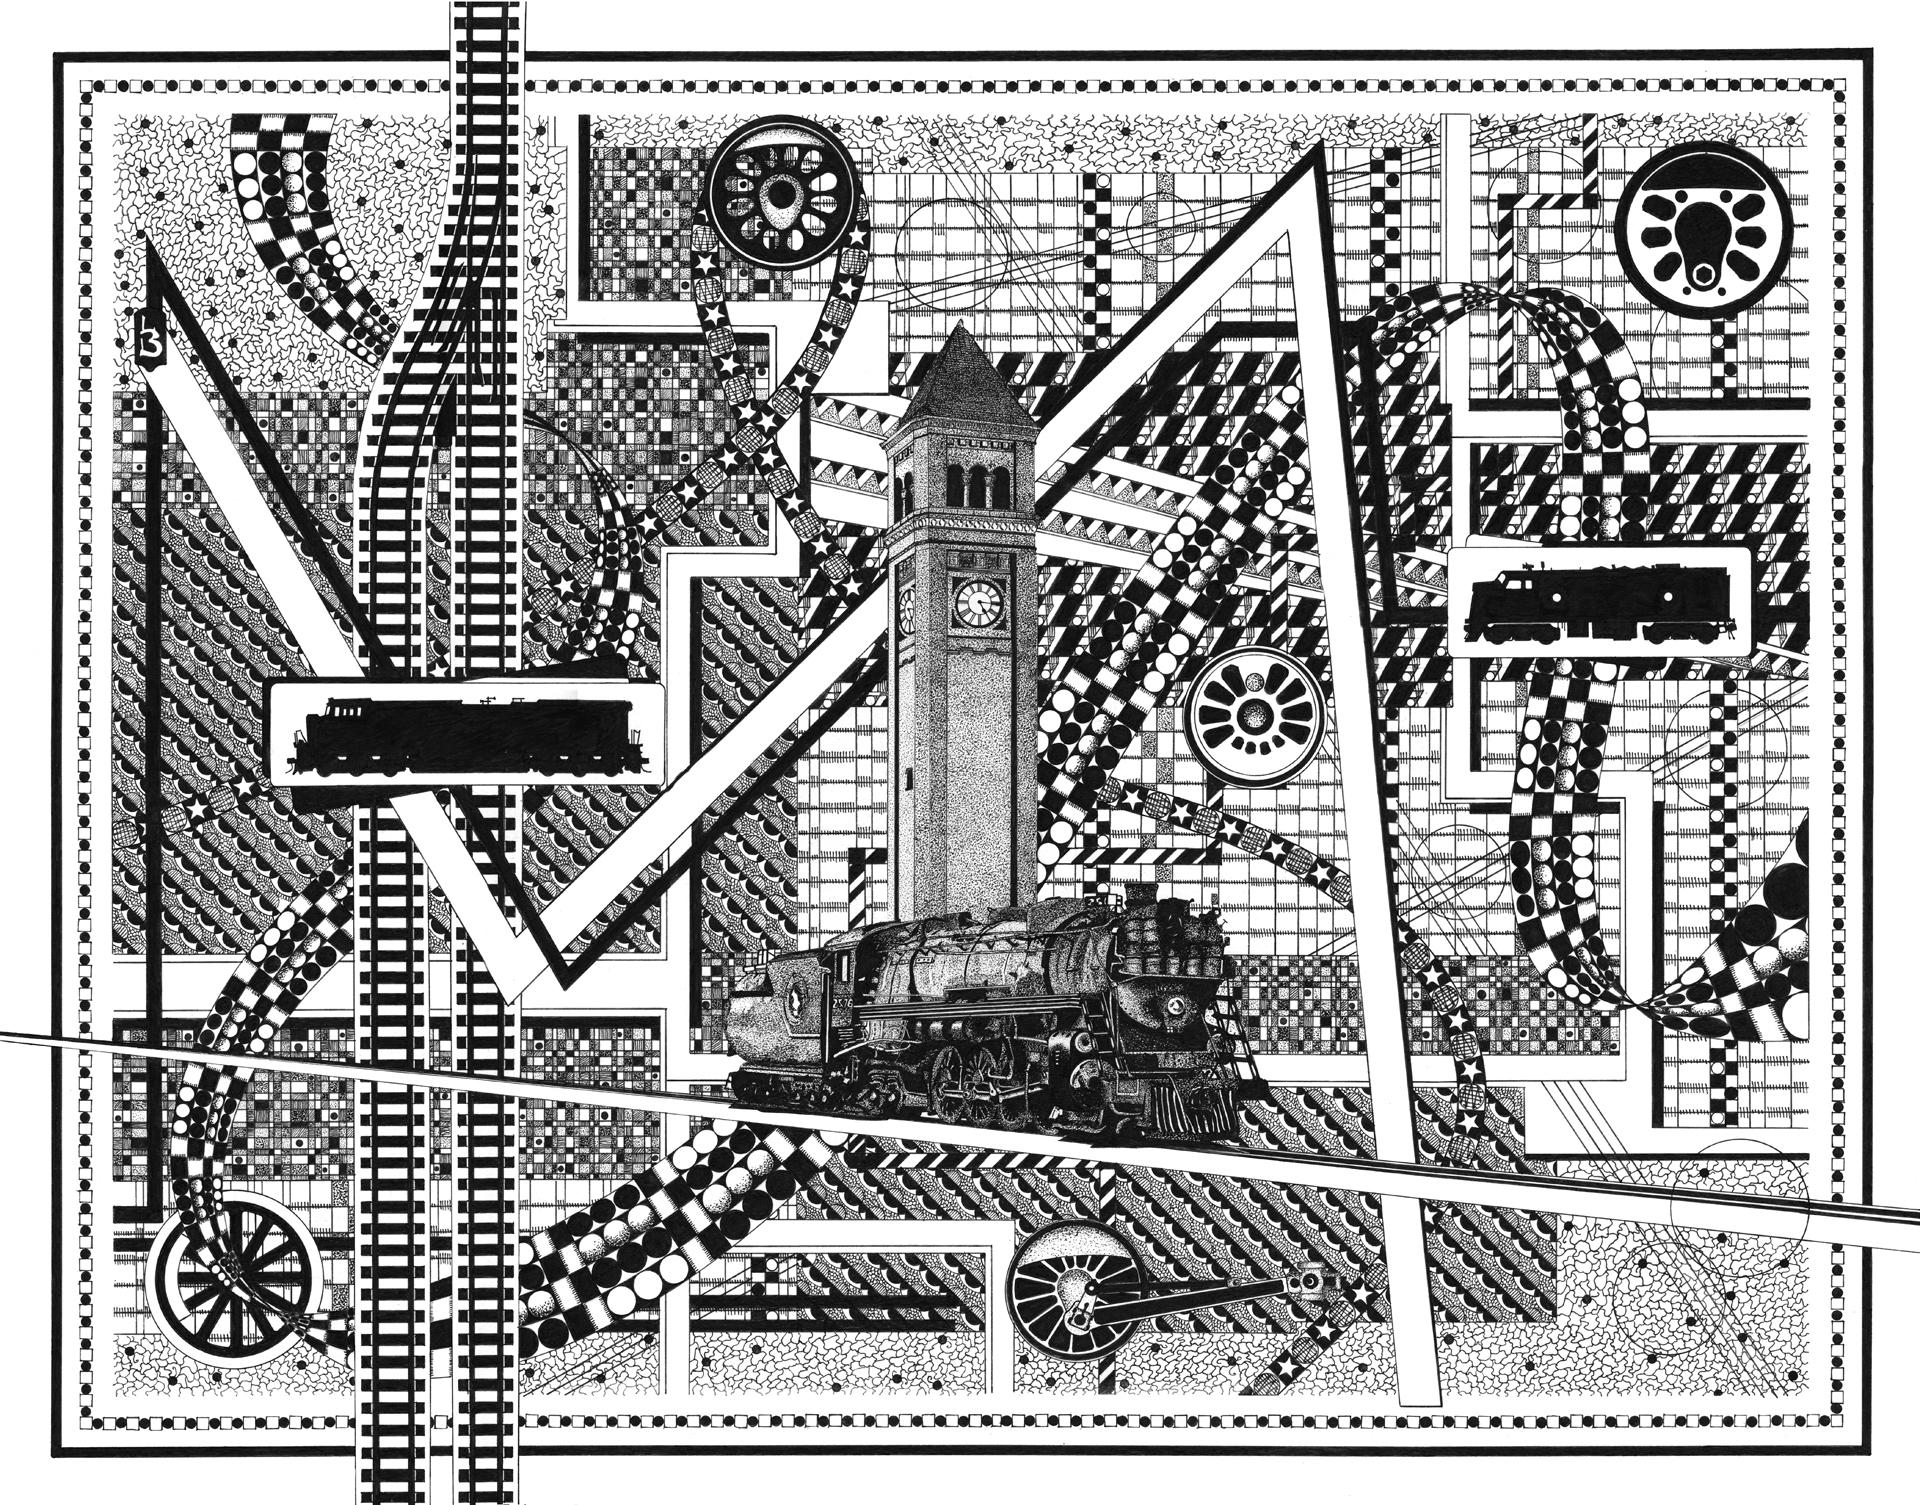 Spokane Clock Tower & Steam Engine (jpeg).jpg